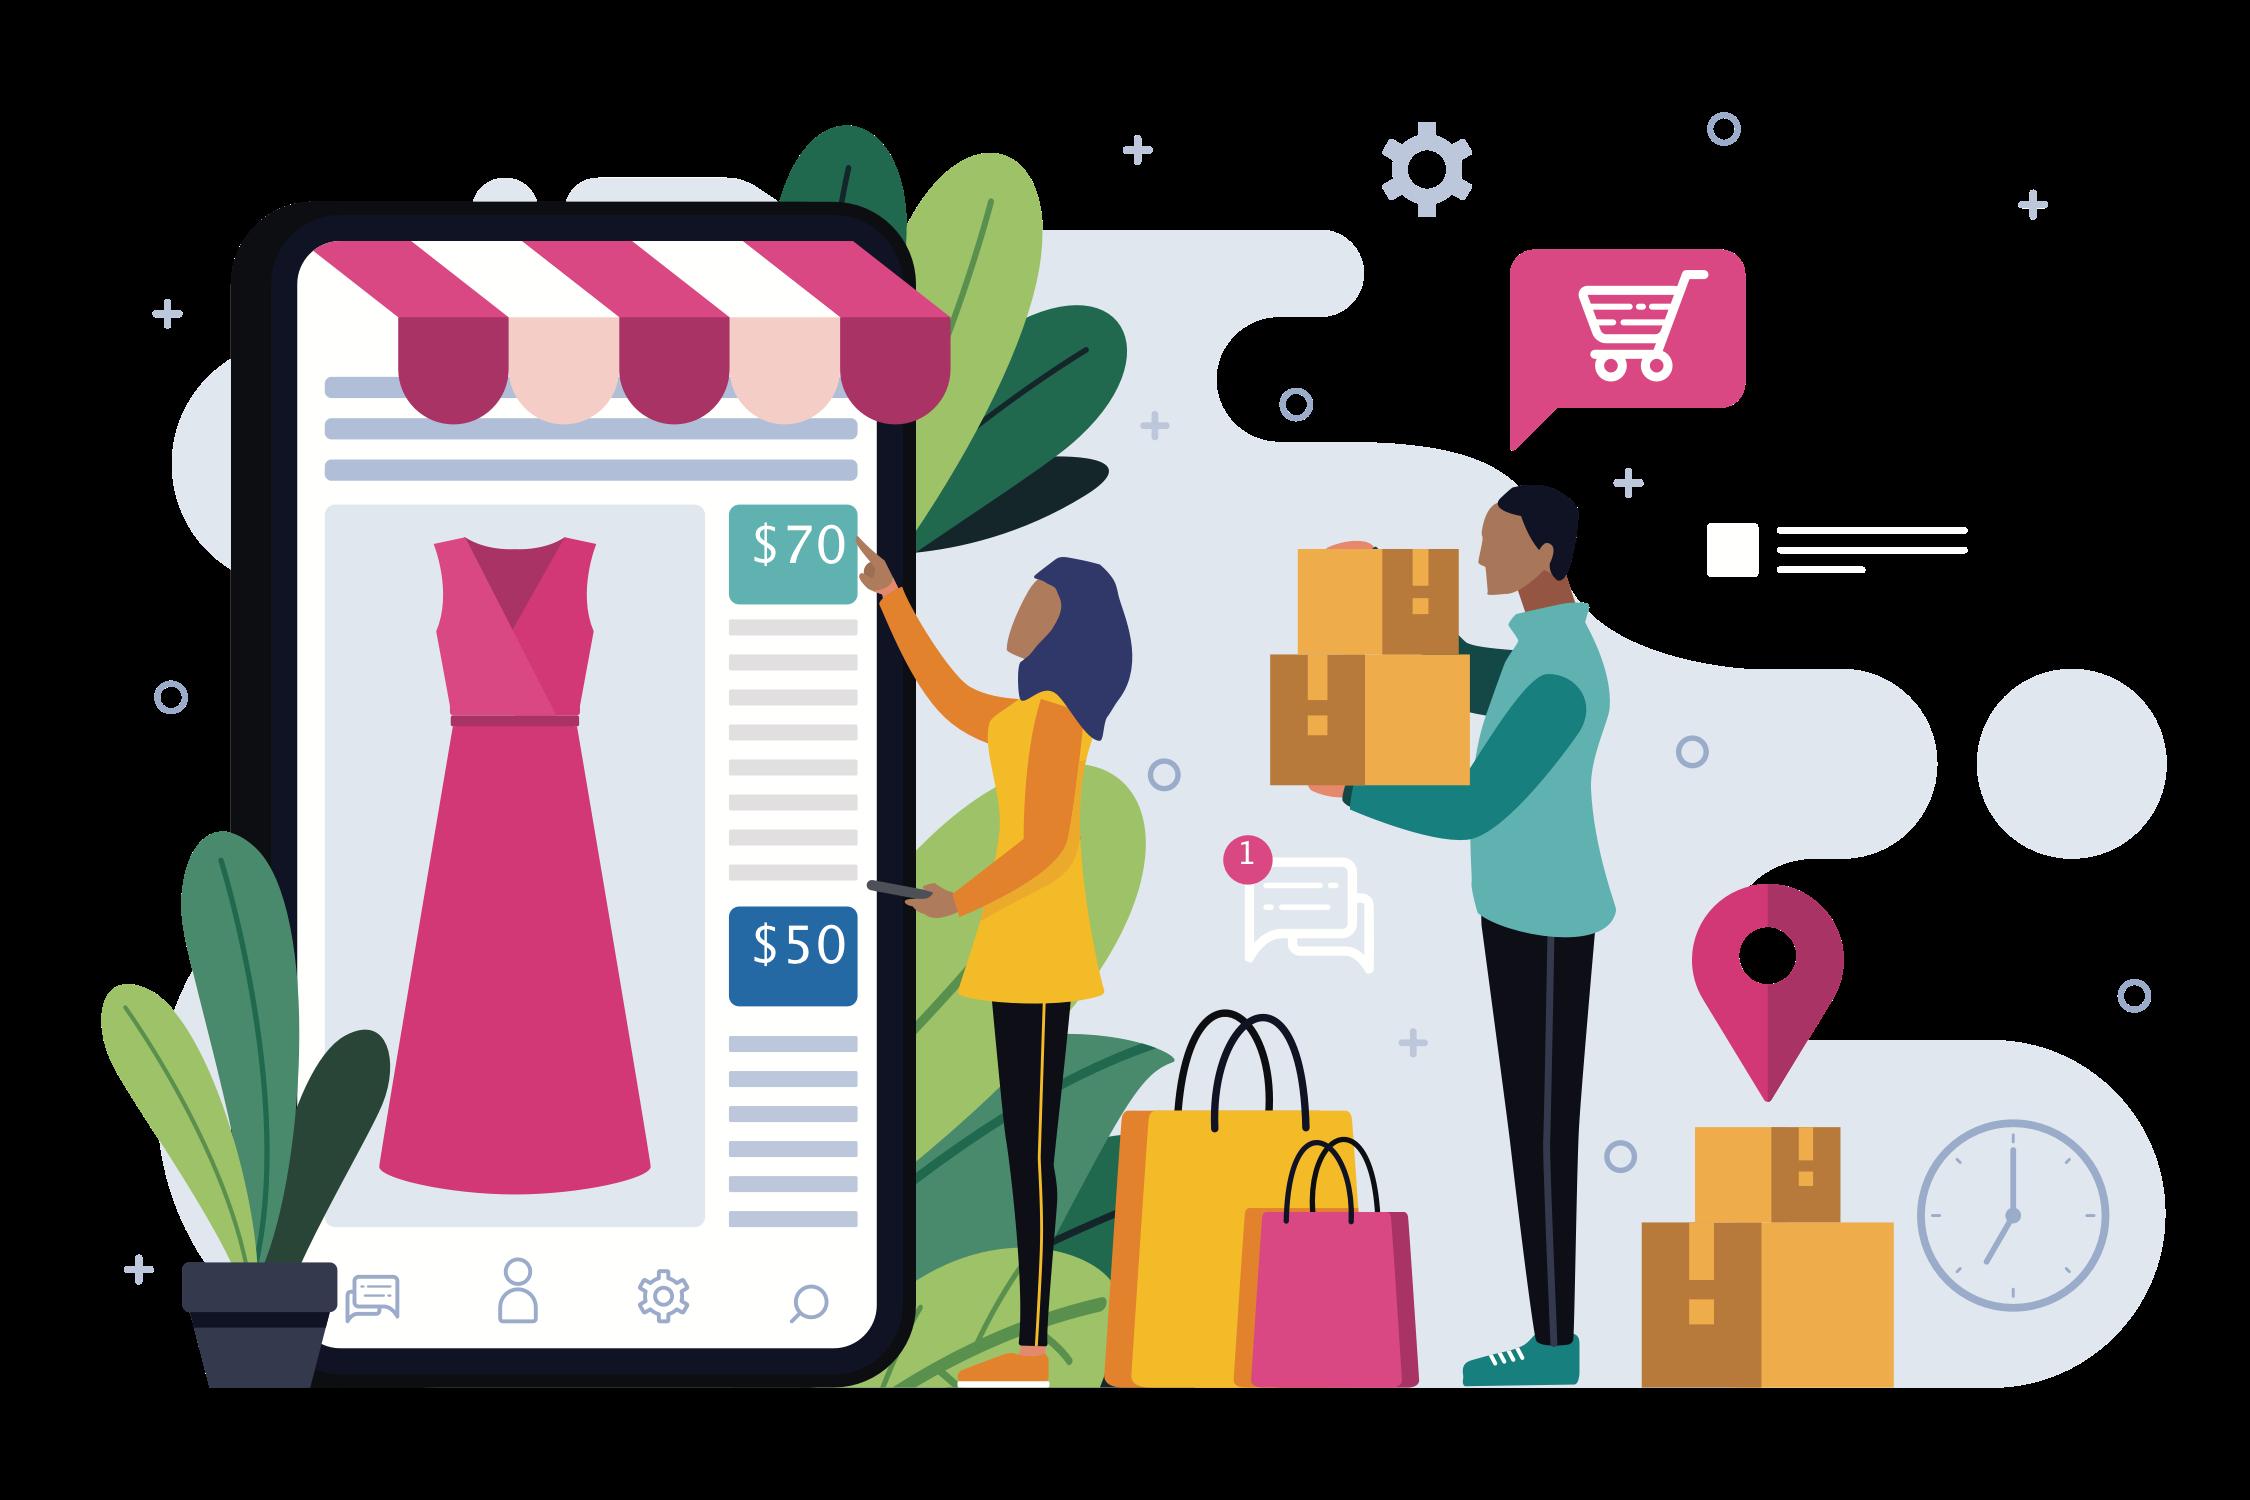 Shopping%20woman%20%26%20man.png?1589729